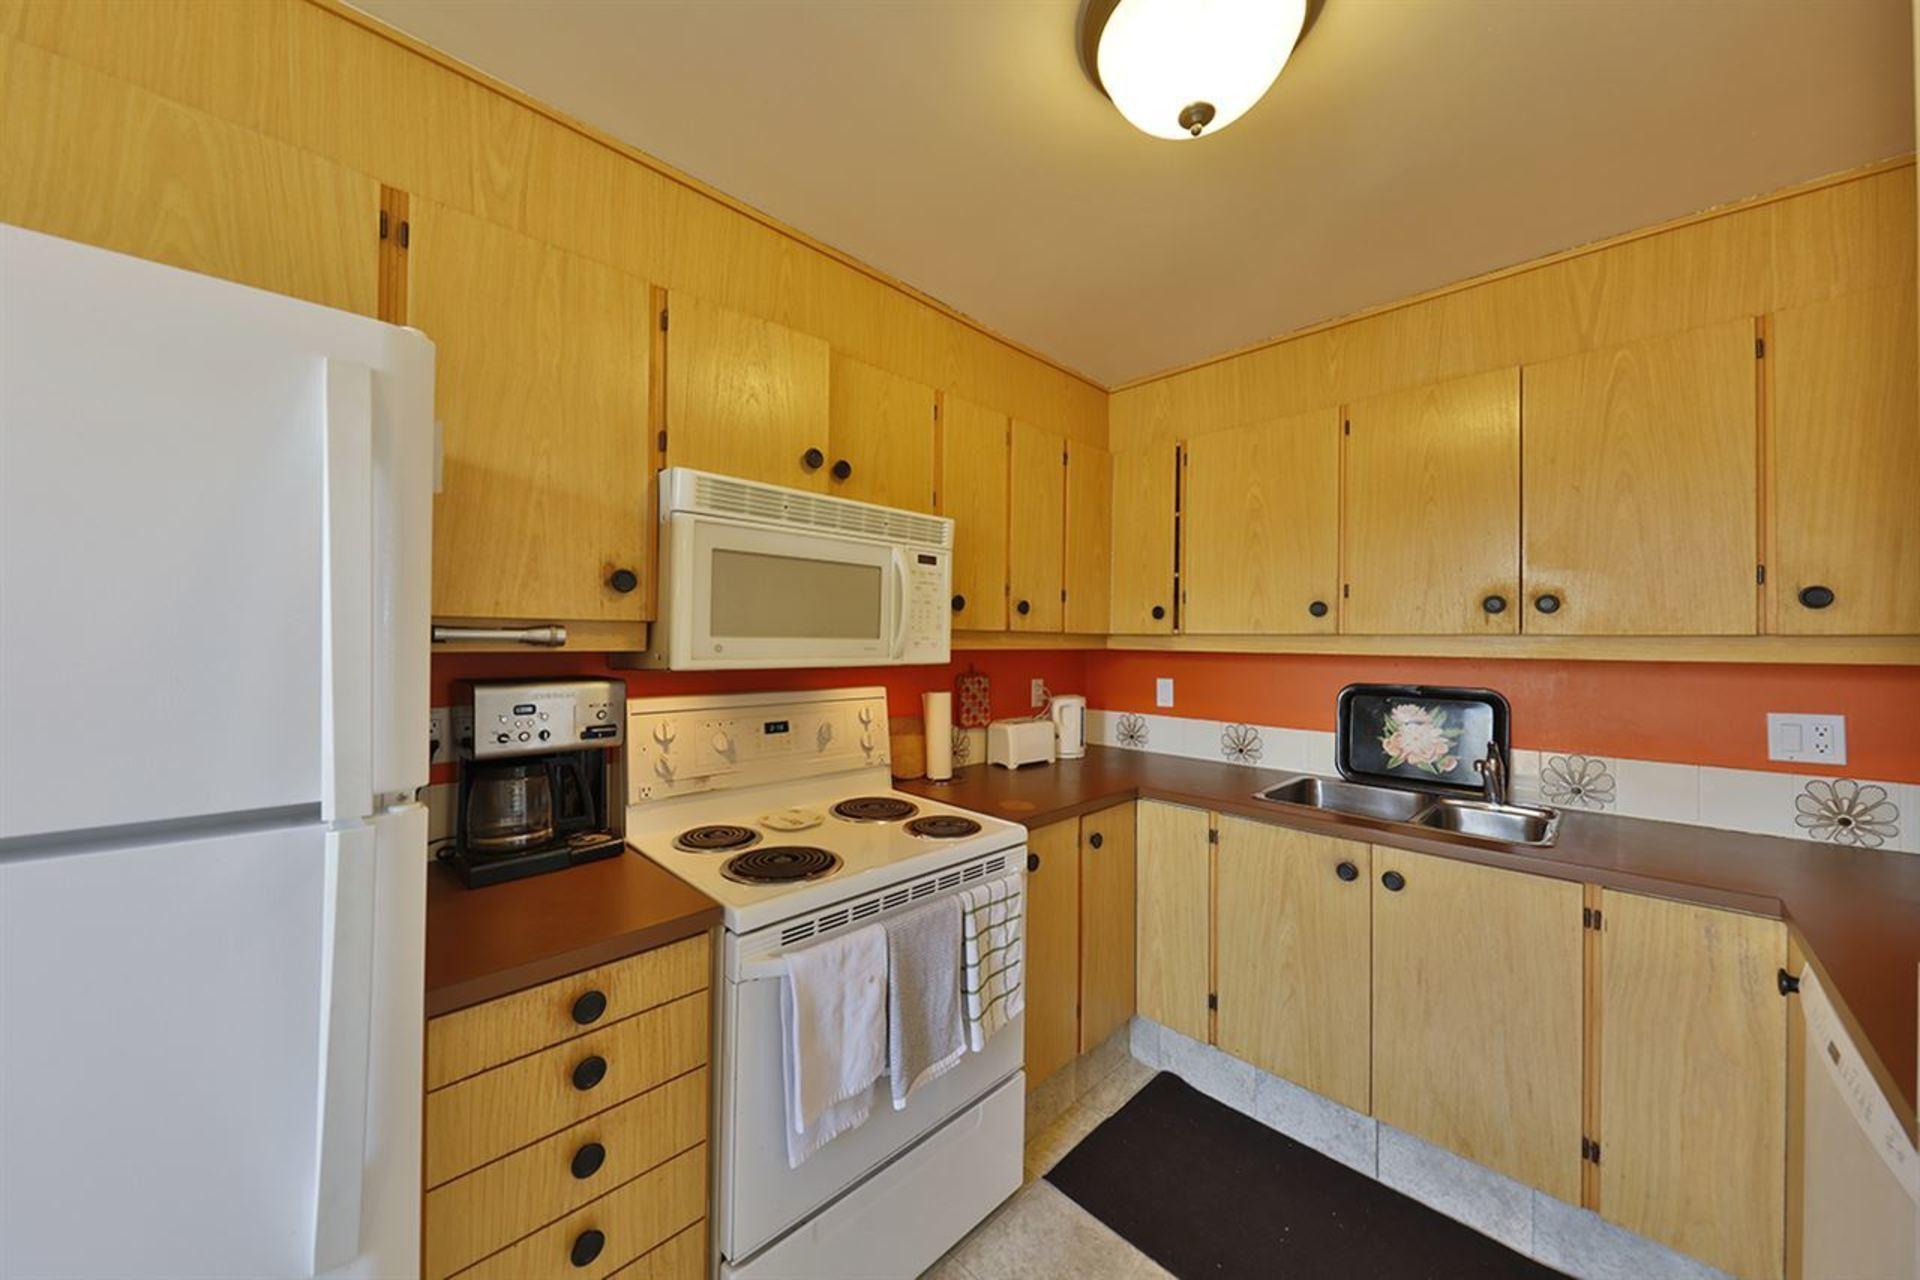 14111-117-street-carlisle-edmonton-05 at 14111 117 Street, Carlisle, Edmonton